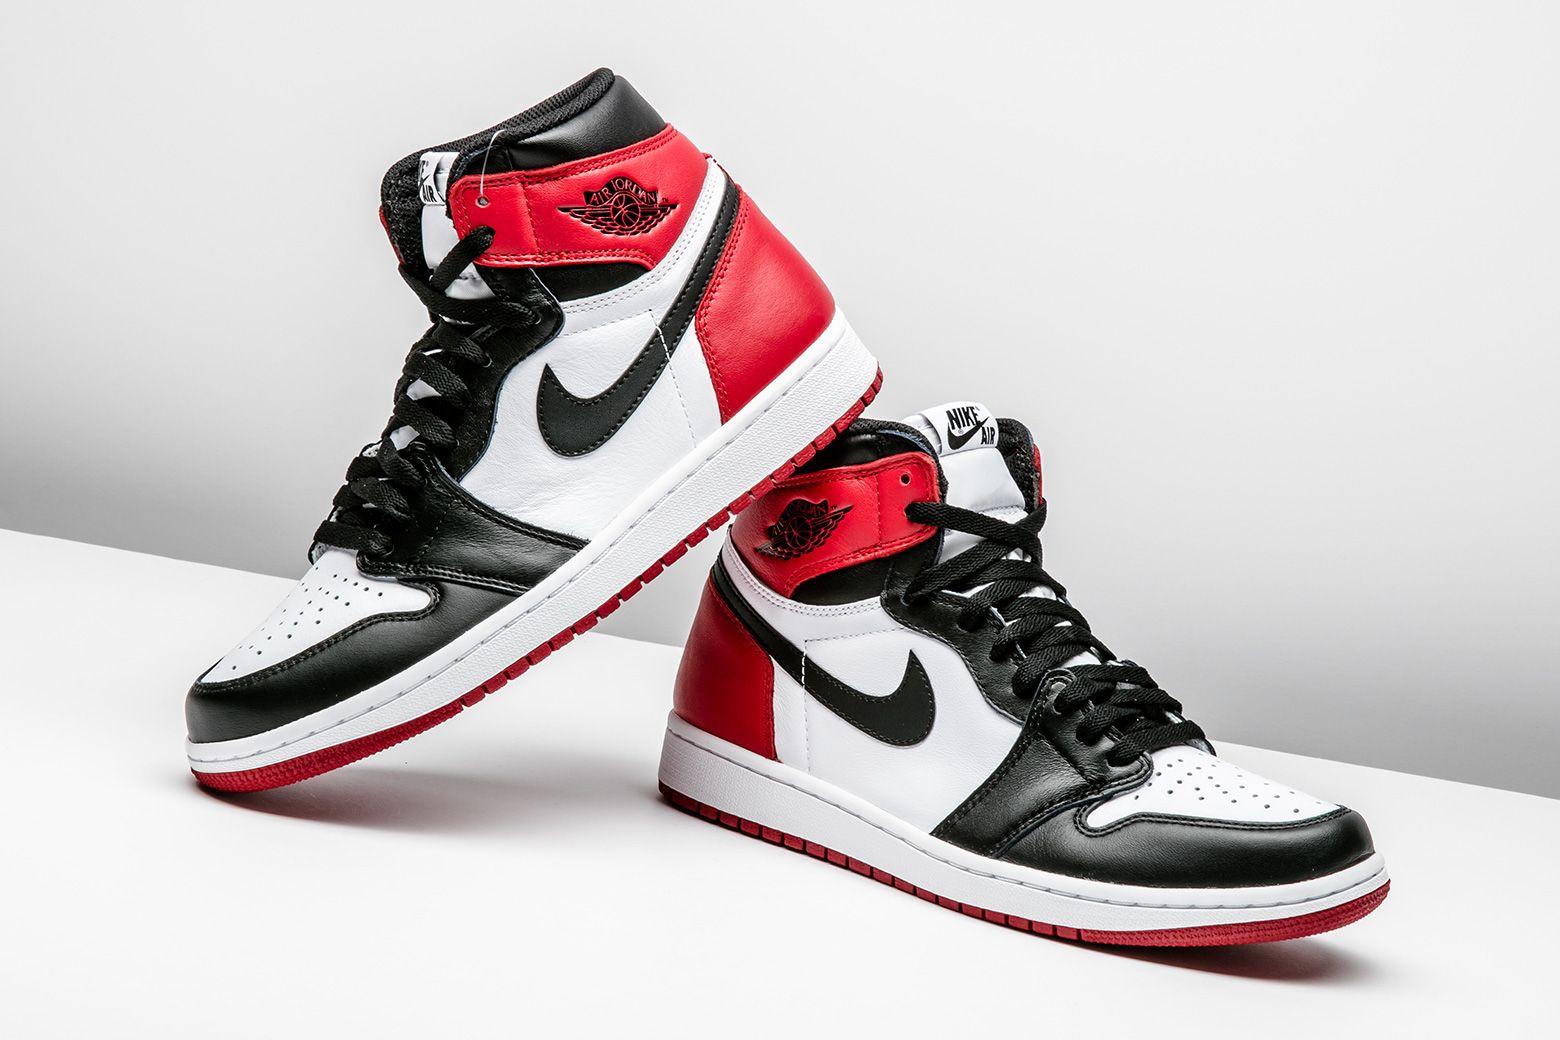 ba261e9e Air Jordan 1 Retro High OG | Air Jordan | Jordans, Air jordans, Air ...